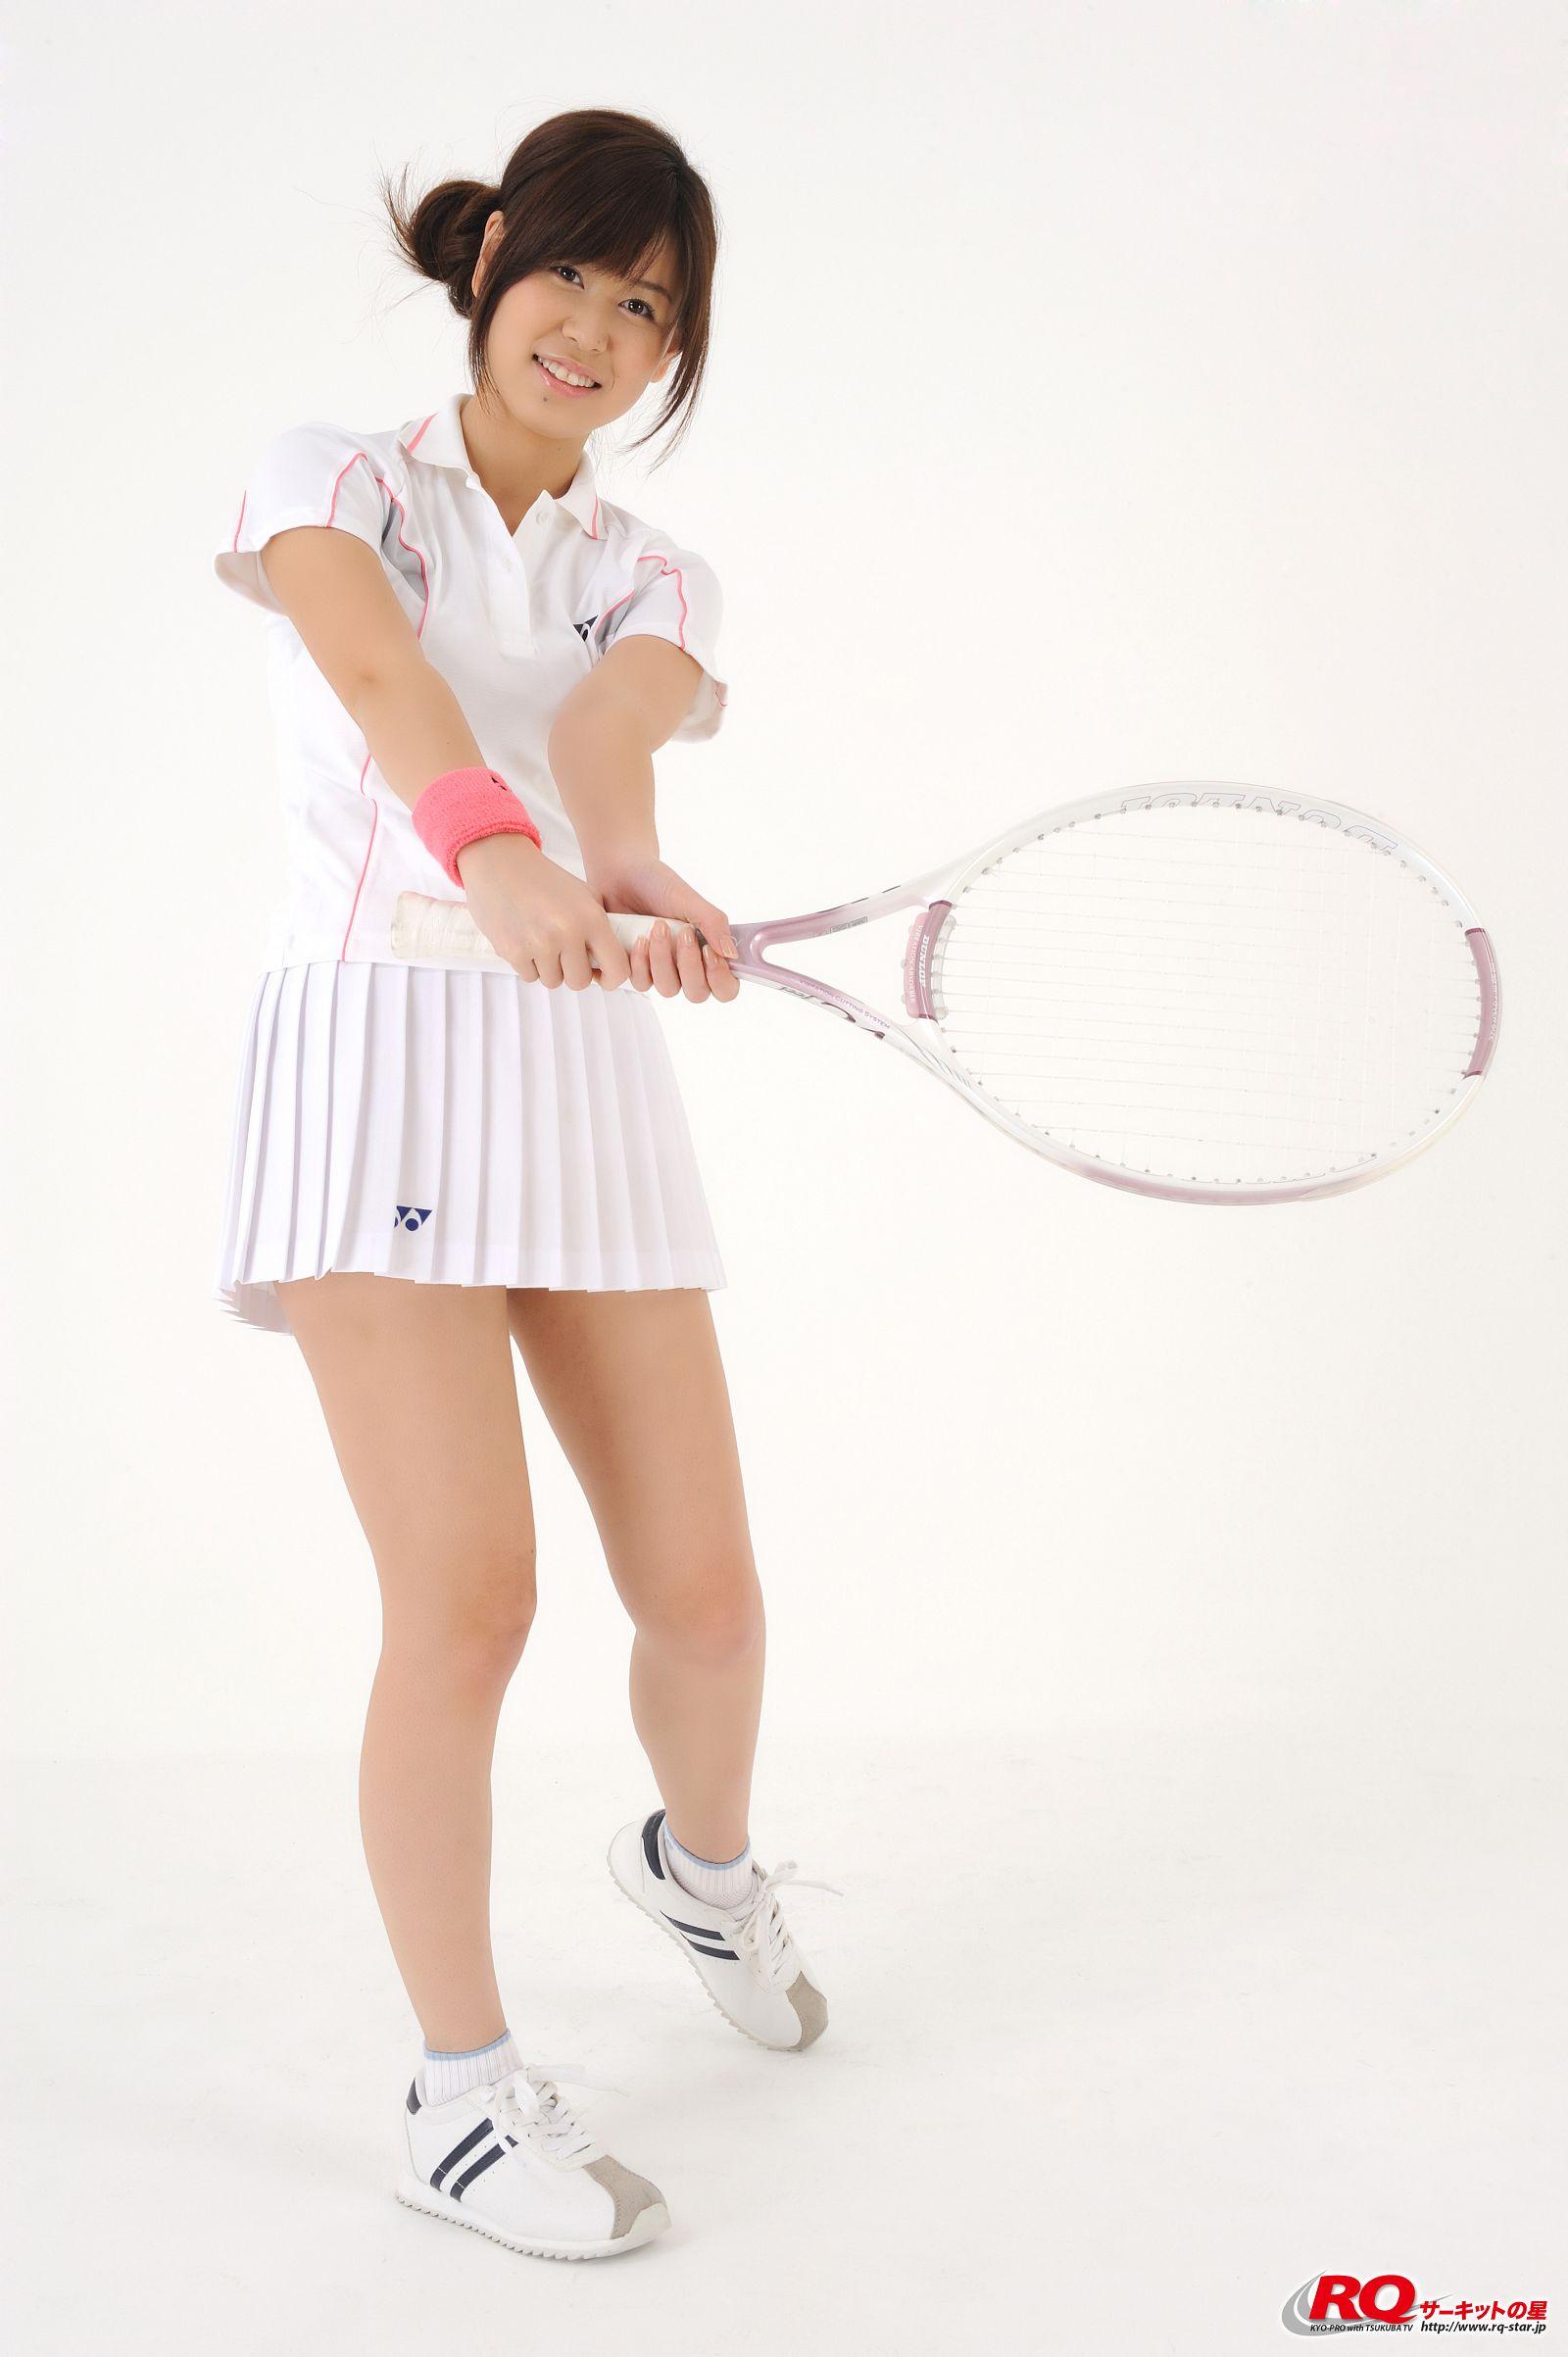 [RQ STAR美女] NO.01120 Airi Nagasaku 永作あいり Tennis Wea[50P] RQ STAR 第4张